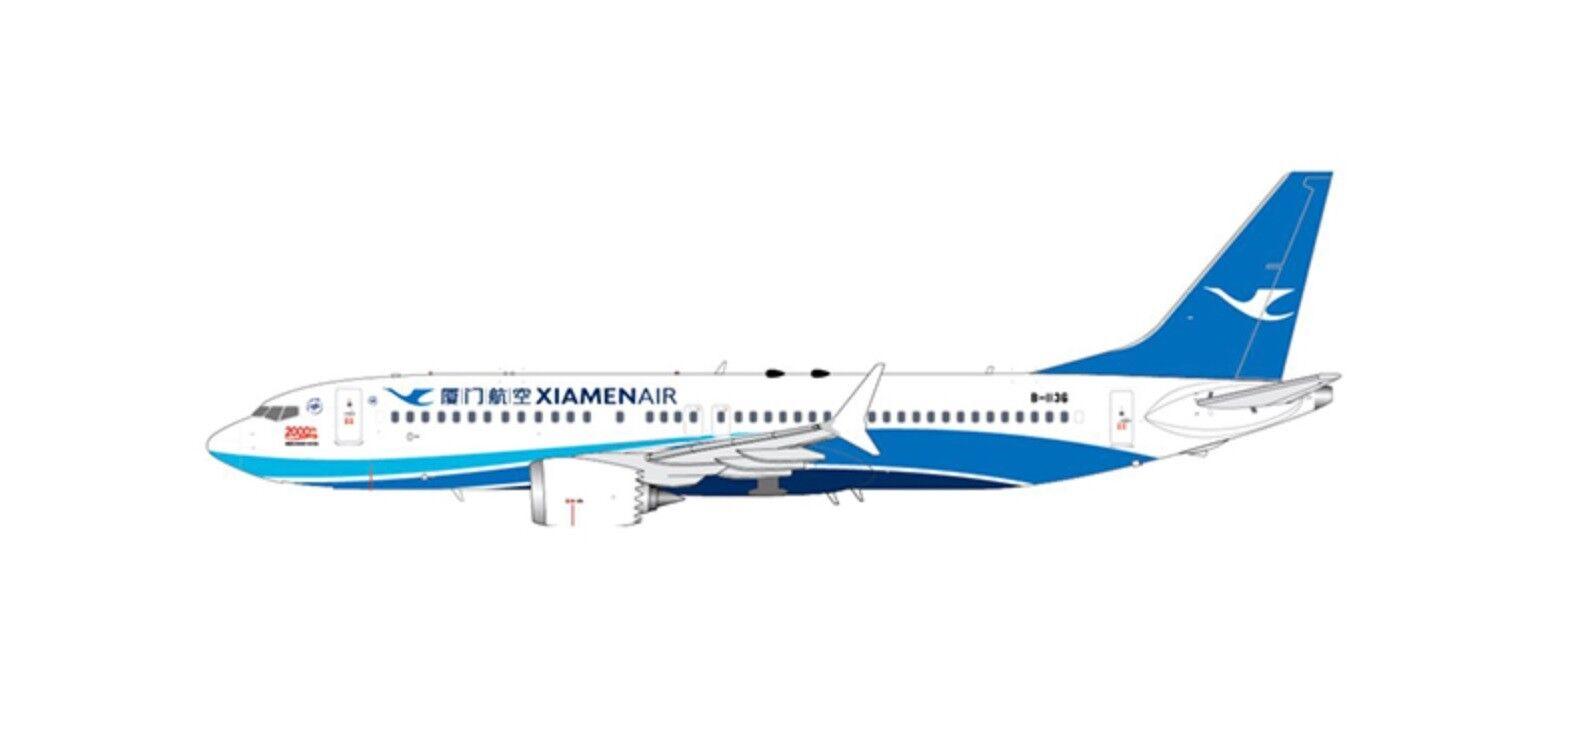 JC WINGS JCLH4109 1 400 XIAMEN AIRLINES BOEING 737-8 MAX 2000TH REG  B-1136